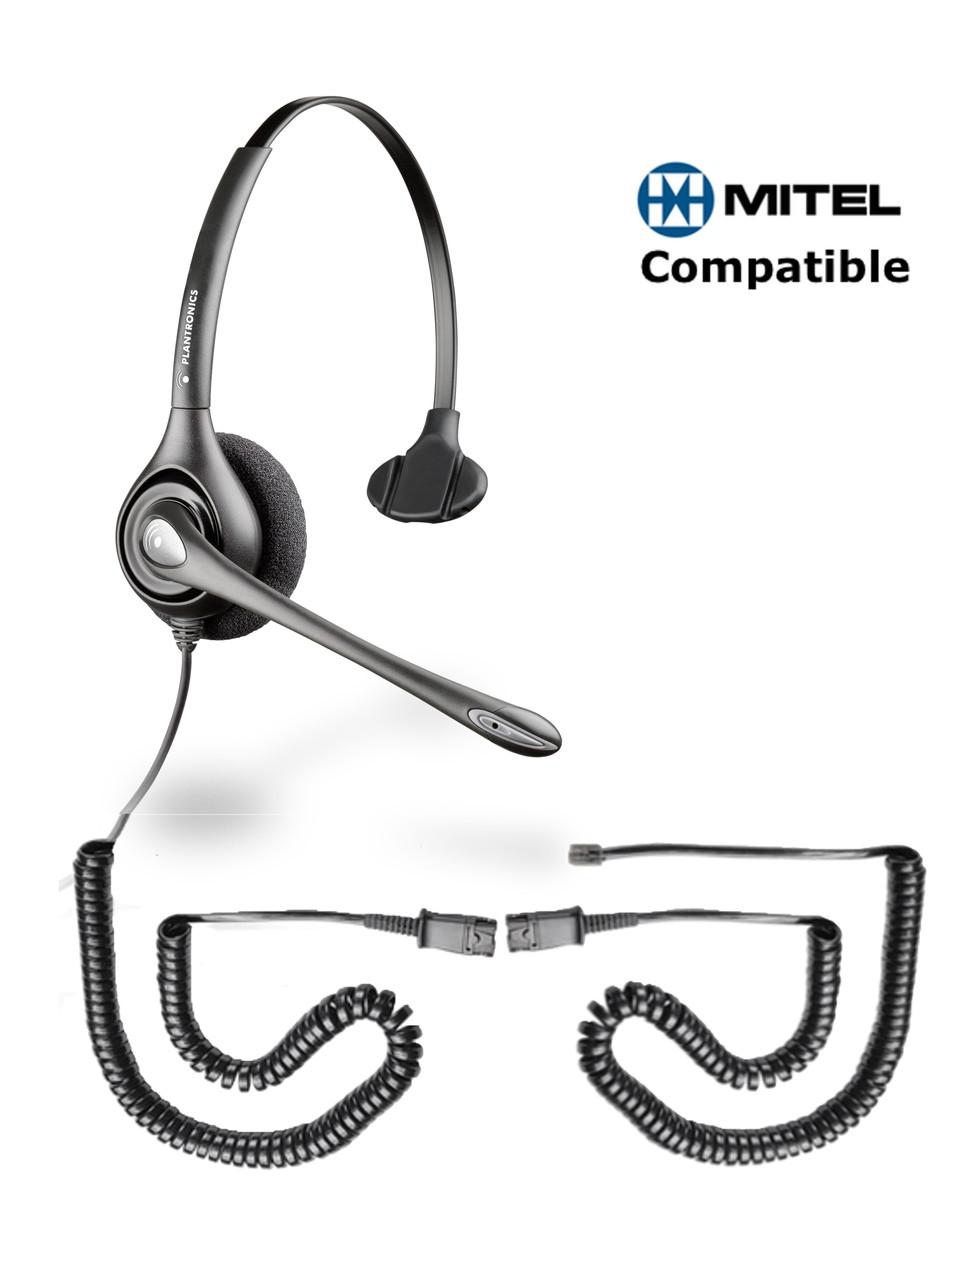 Mitel Compatible Plantronics HW251N SupraPlus Direct Connect Headset,  64338-31 | Mitel VoIP phones: 5000 series, Superconsoles and Superset